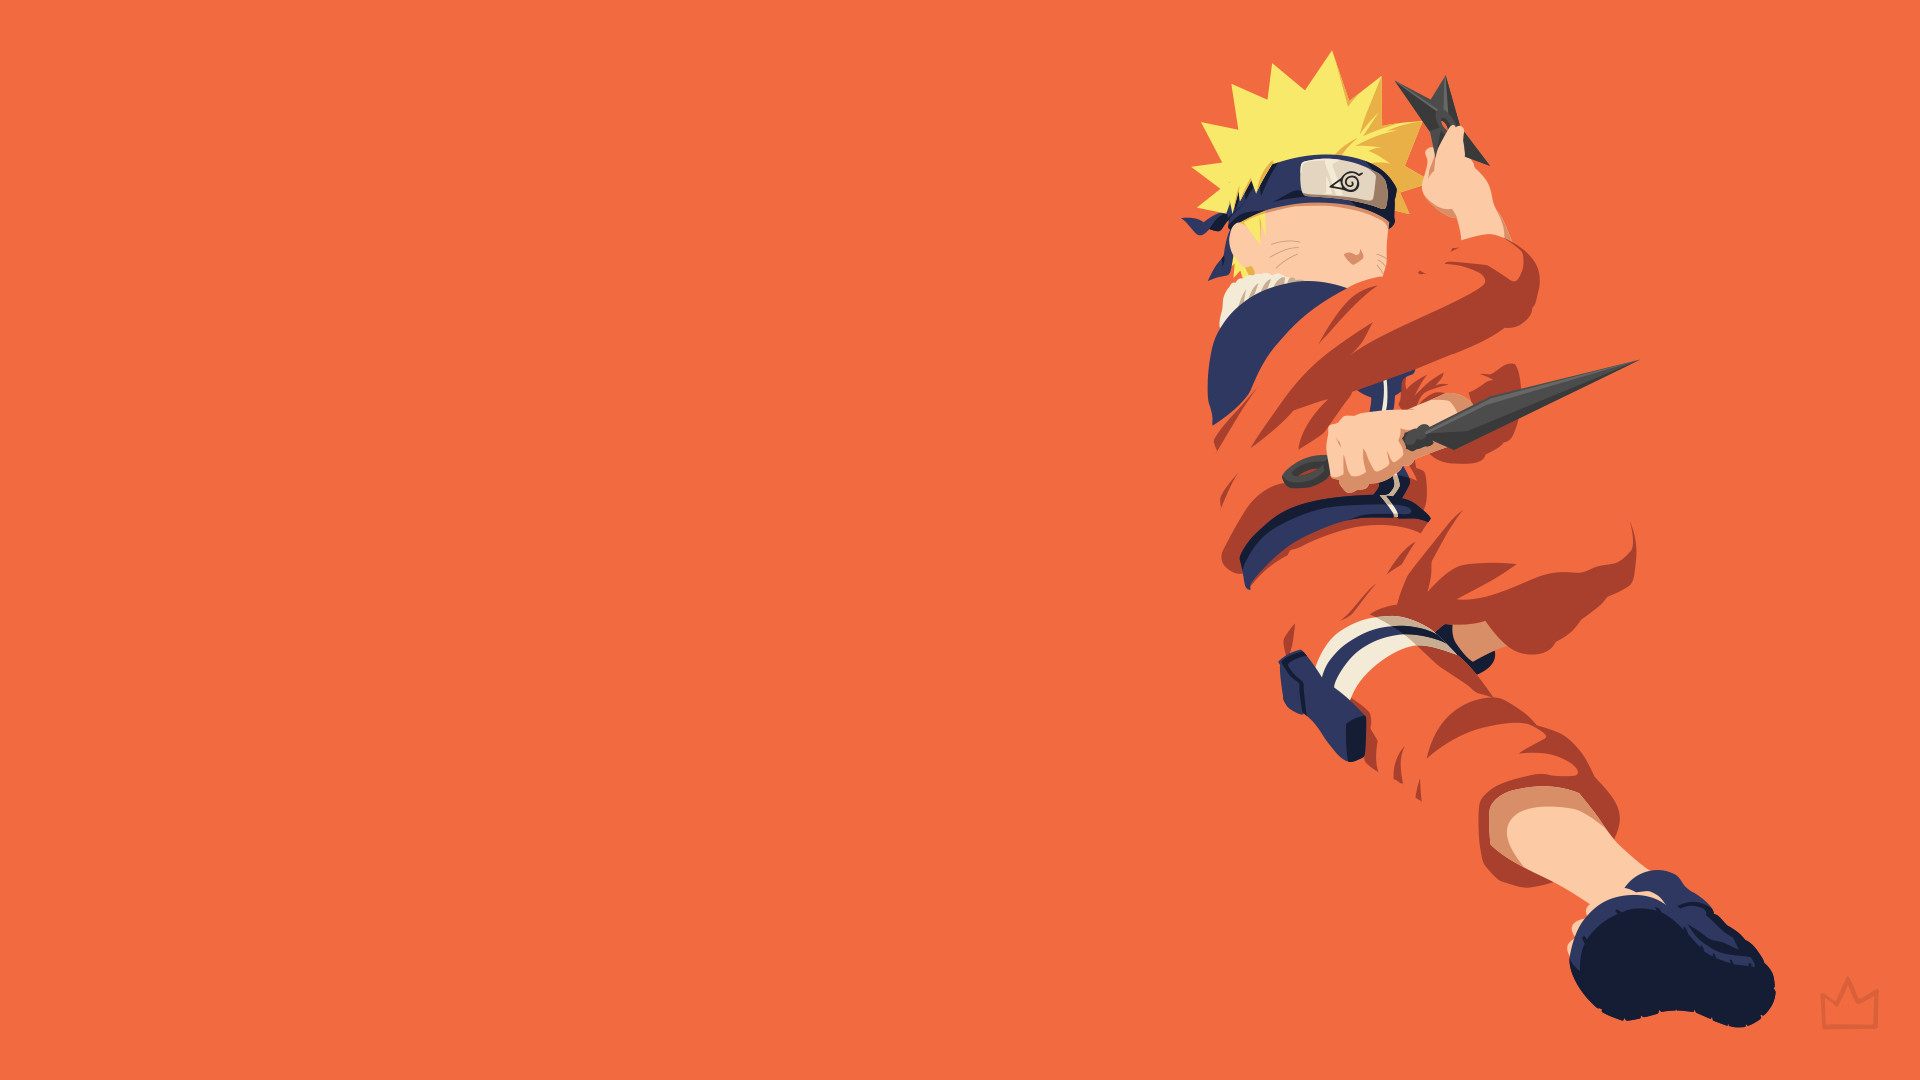 Res: 1920x1080, Kiba Inuzuka Akamaru (Naruto) by ncoll36 on DeviantArt